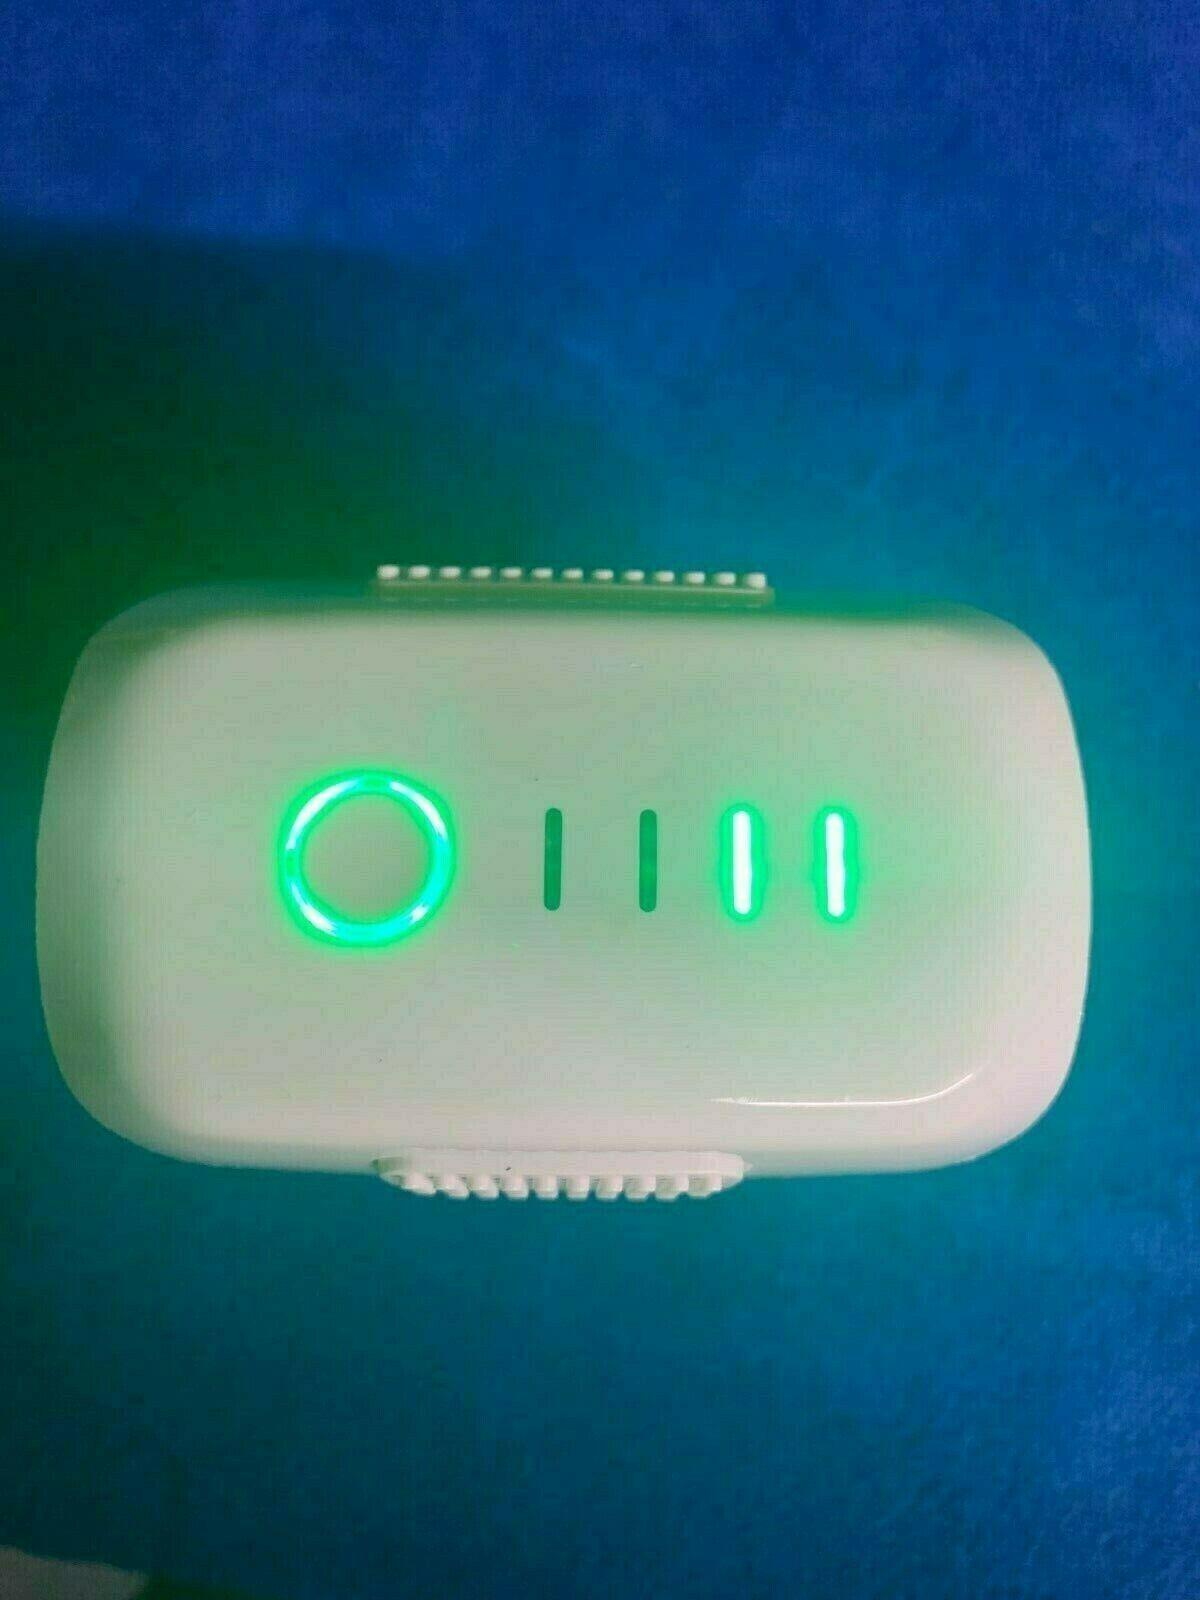 Genuine DJI Phantom 4 Battery 5350 mAh PH4-5350 Only 48 Charges